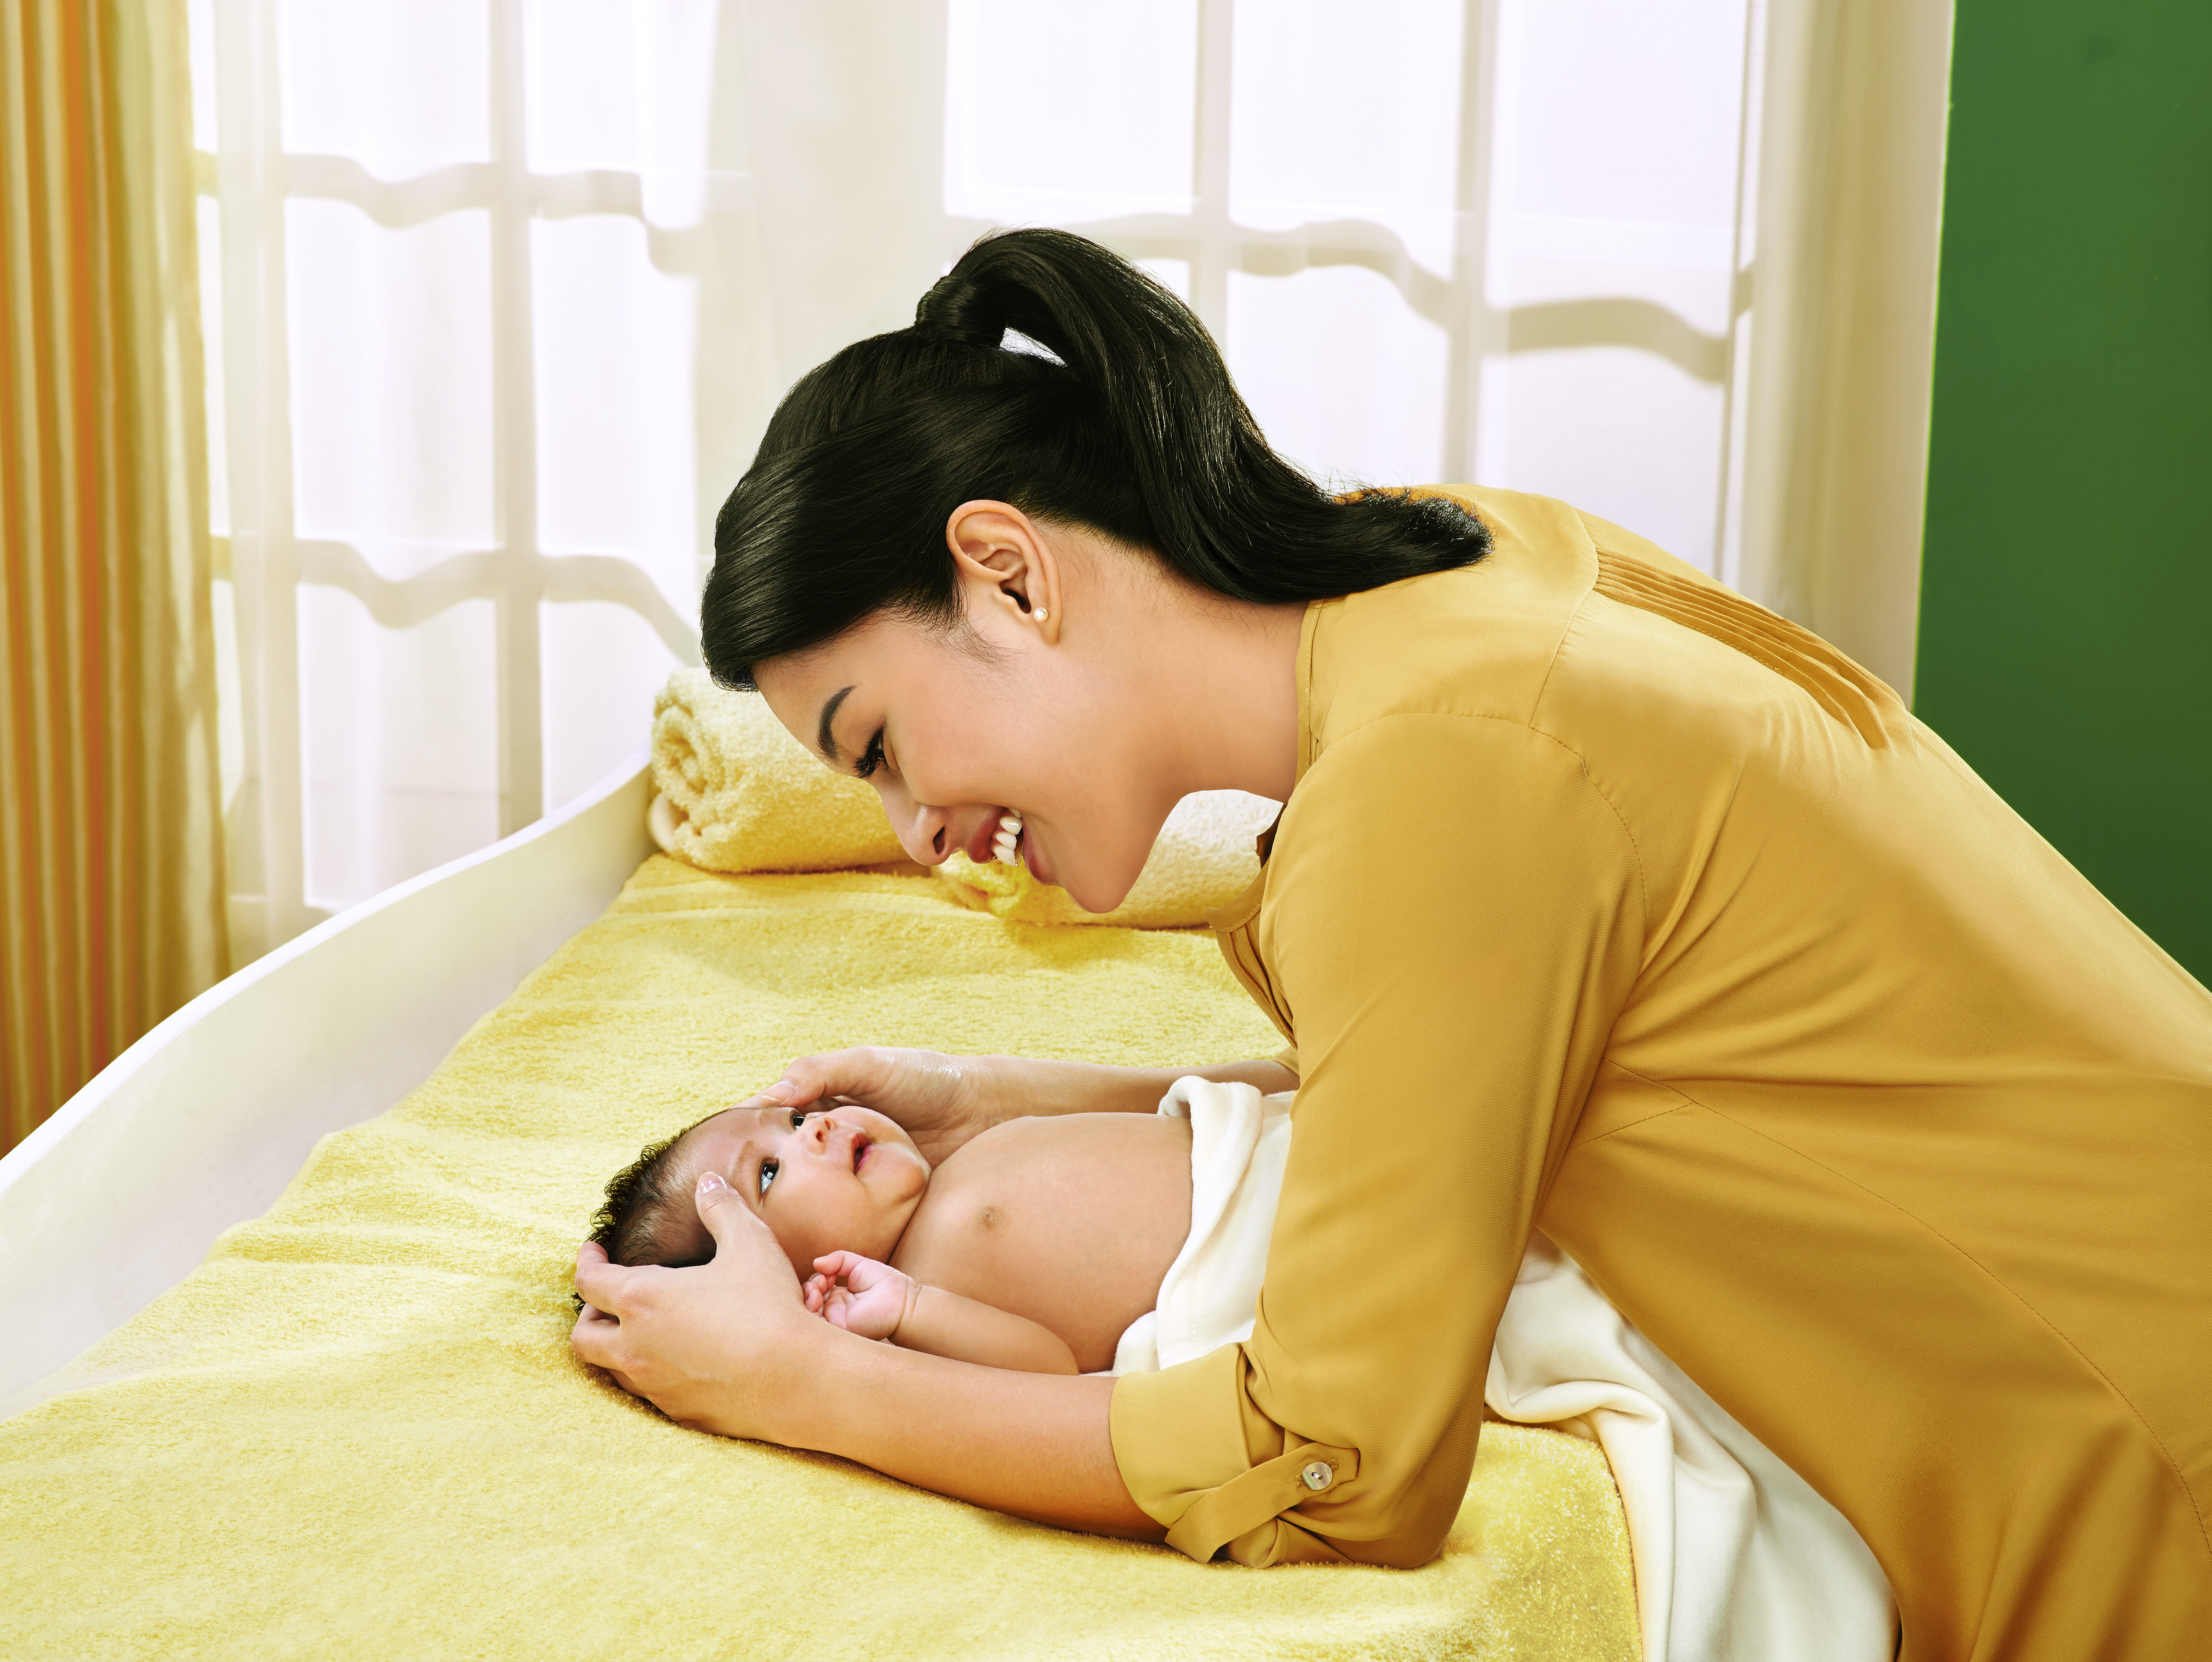 Teknik Pijat Bayi Dulu dan Sekarang